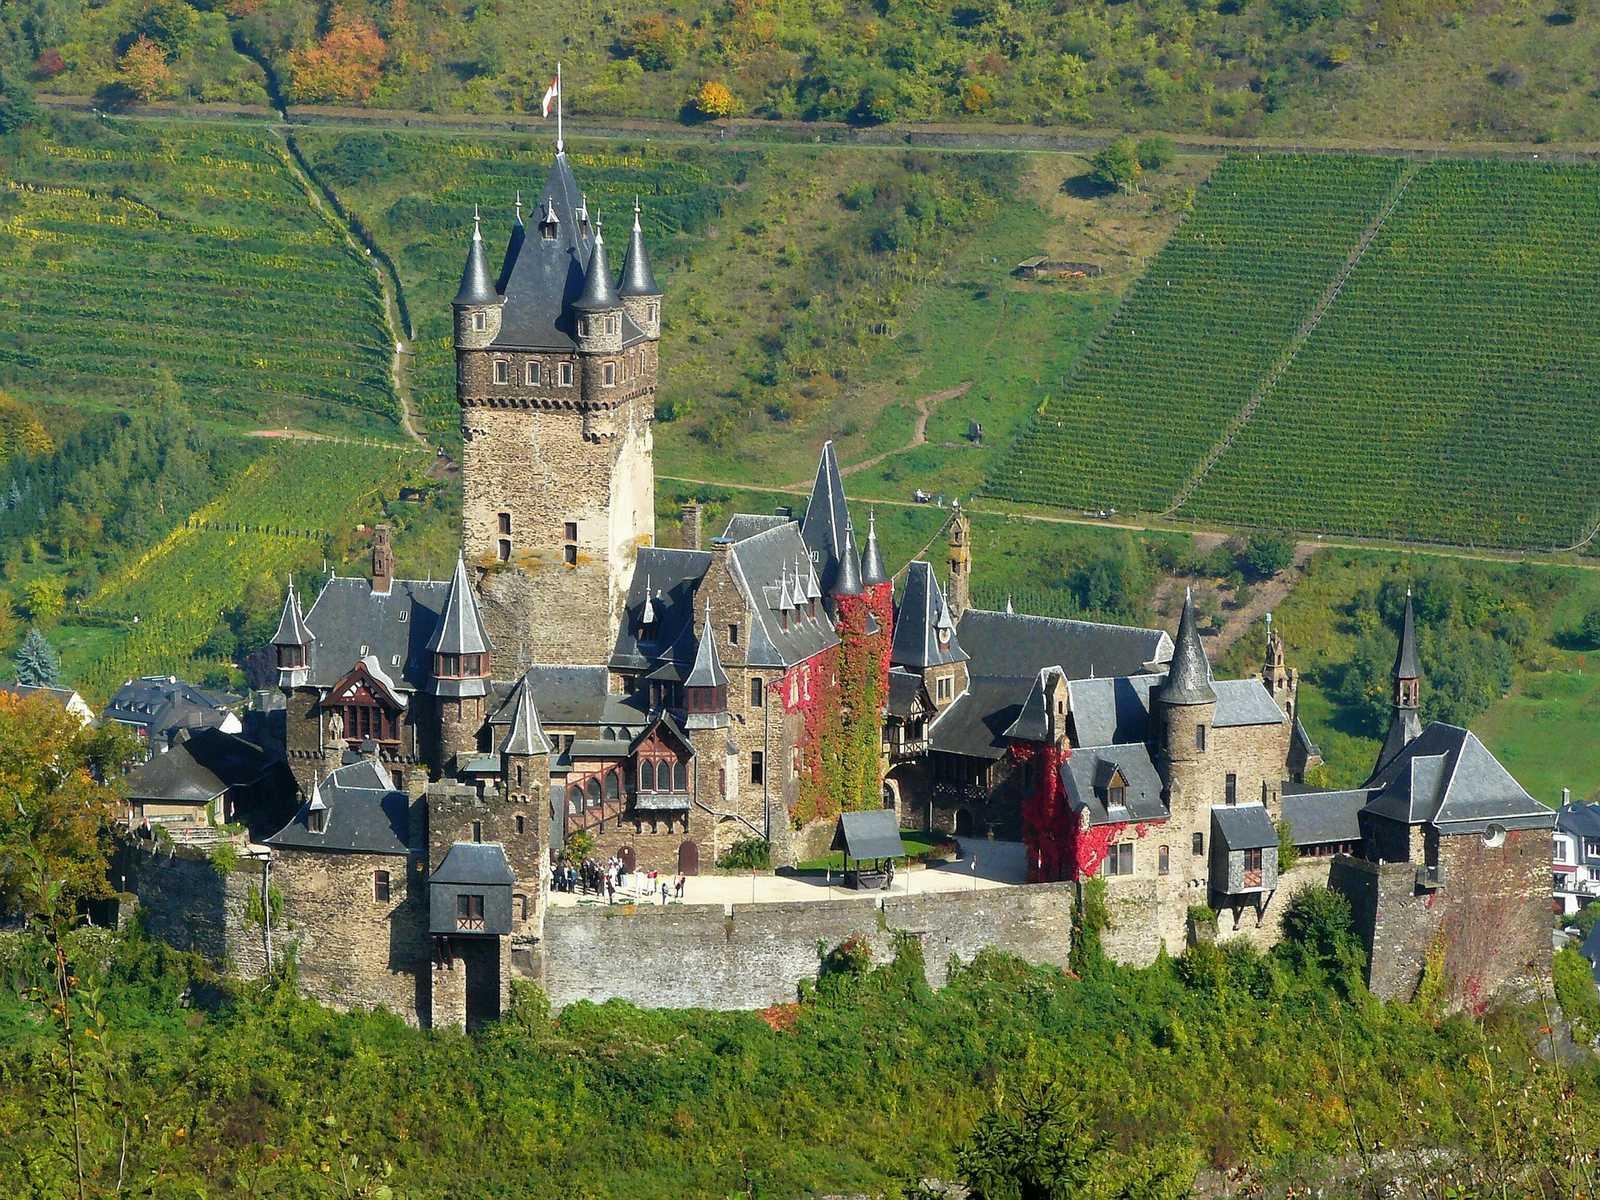 cocoparisienne-mosel-castle-vineyards-event-2808141600x